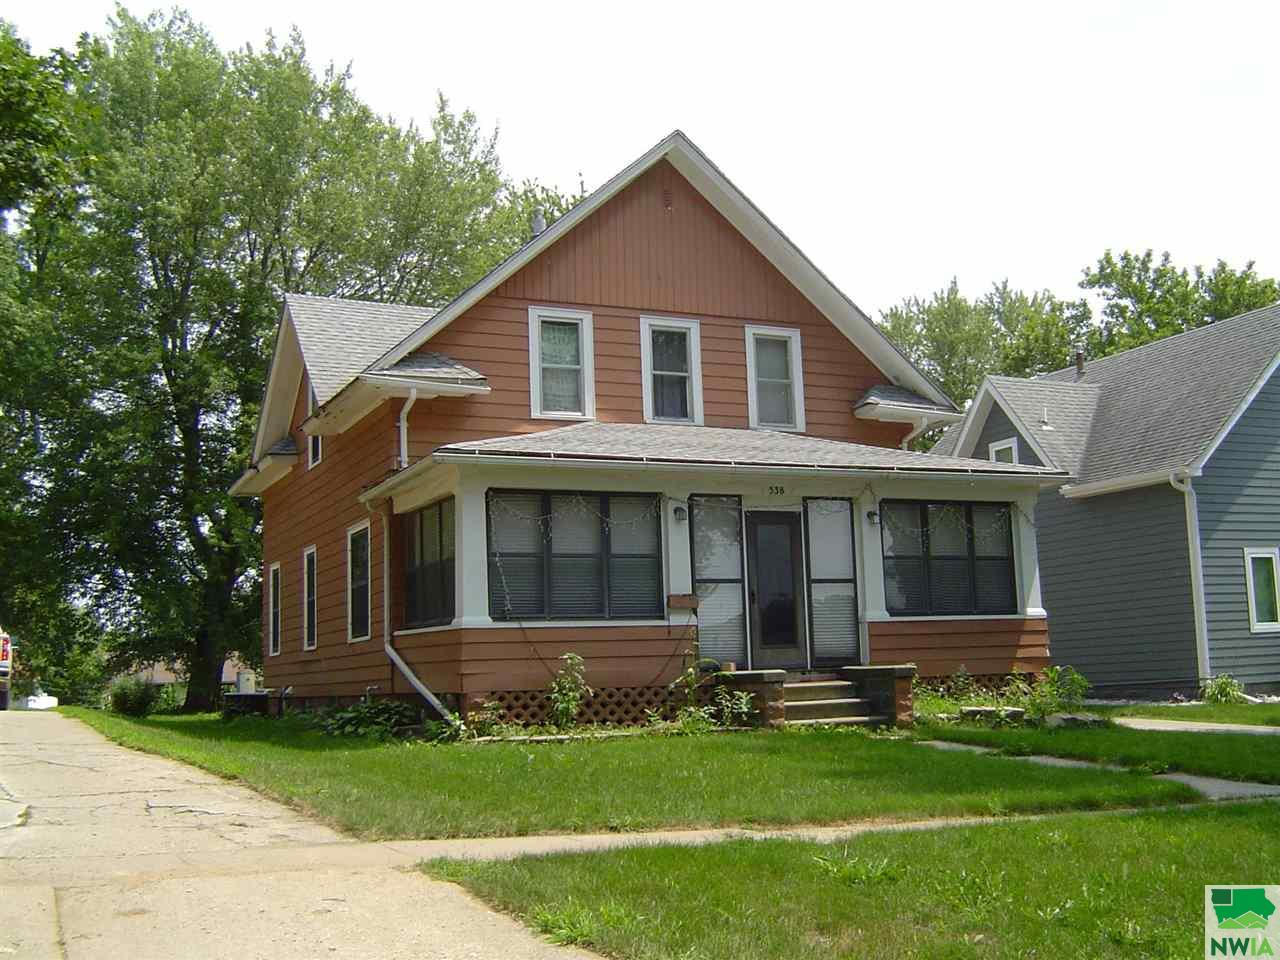 538 1st Ave. SE, Sioux Center, Iowa 51250-